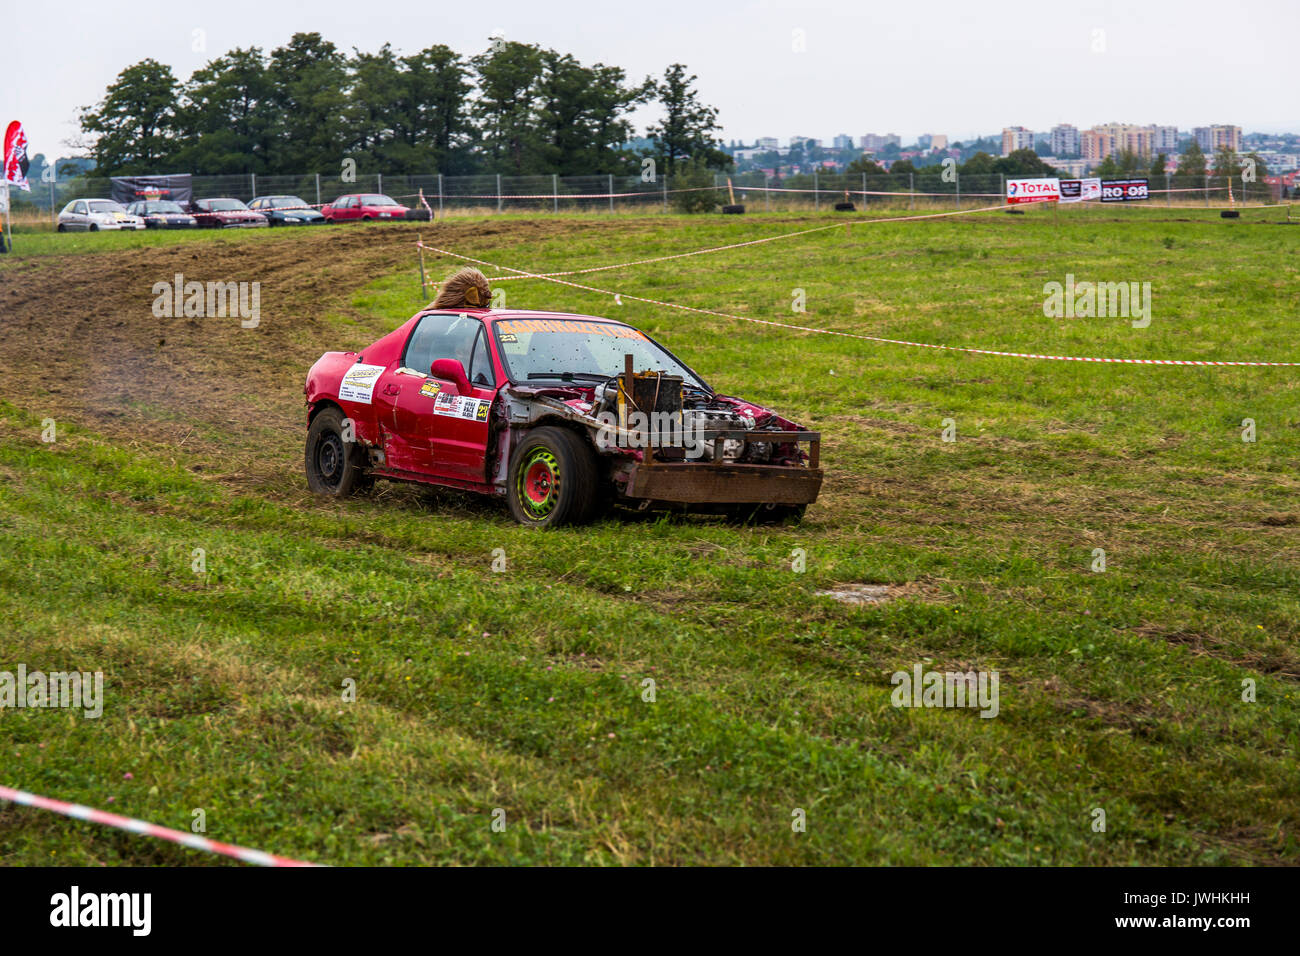 Bielsko-Biala, Poland. 12th Aug, 2017. International automotive trade fairs - MotoShow Bielsko-Biala. Wreck car Stock Photo